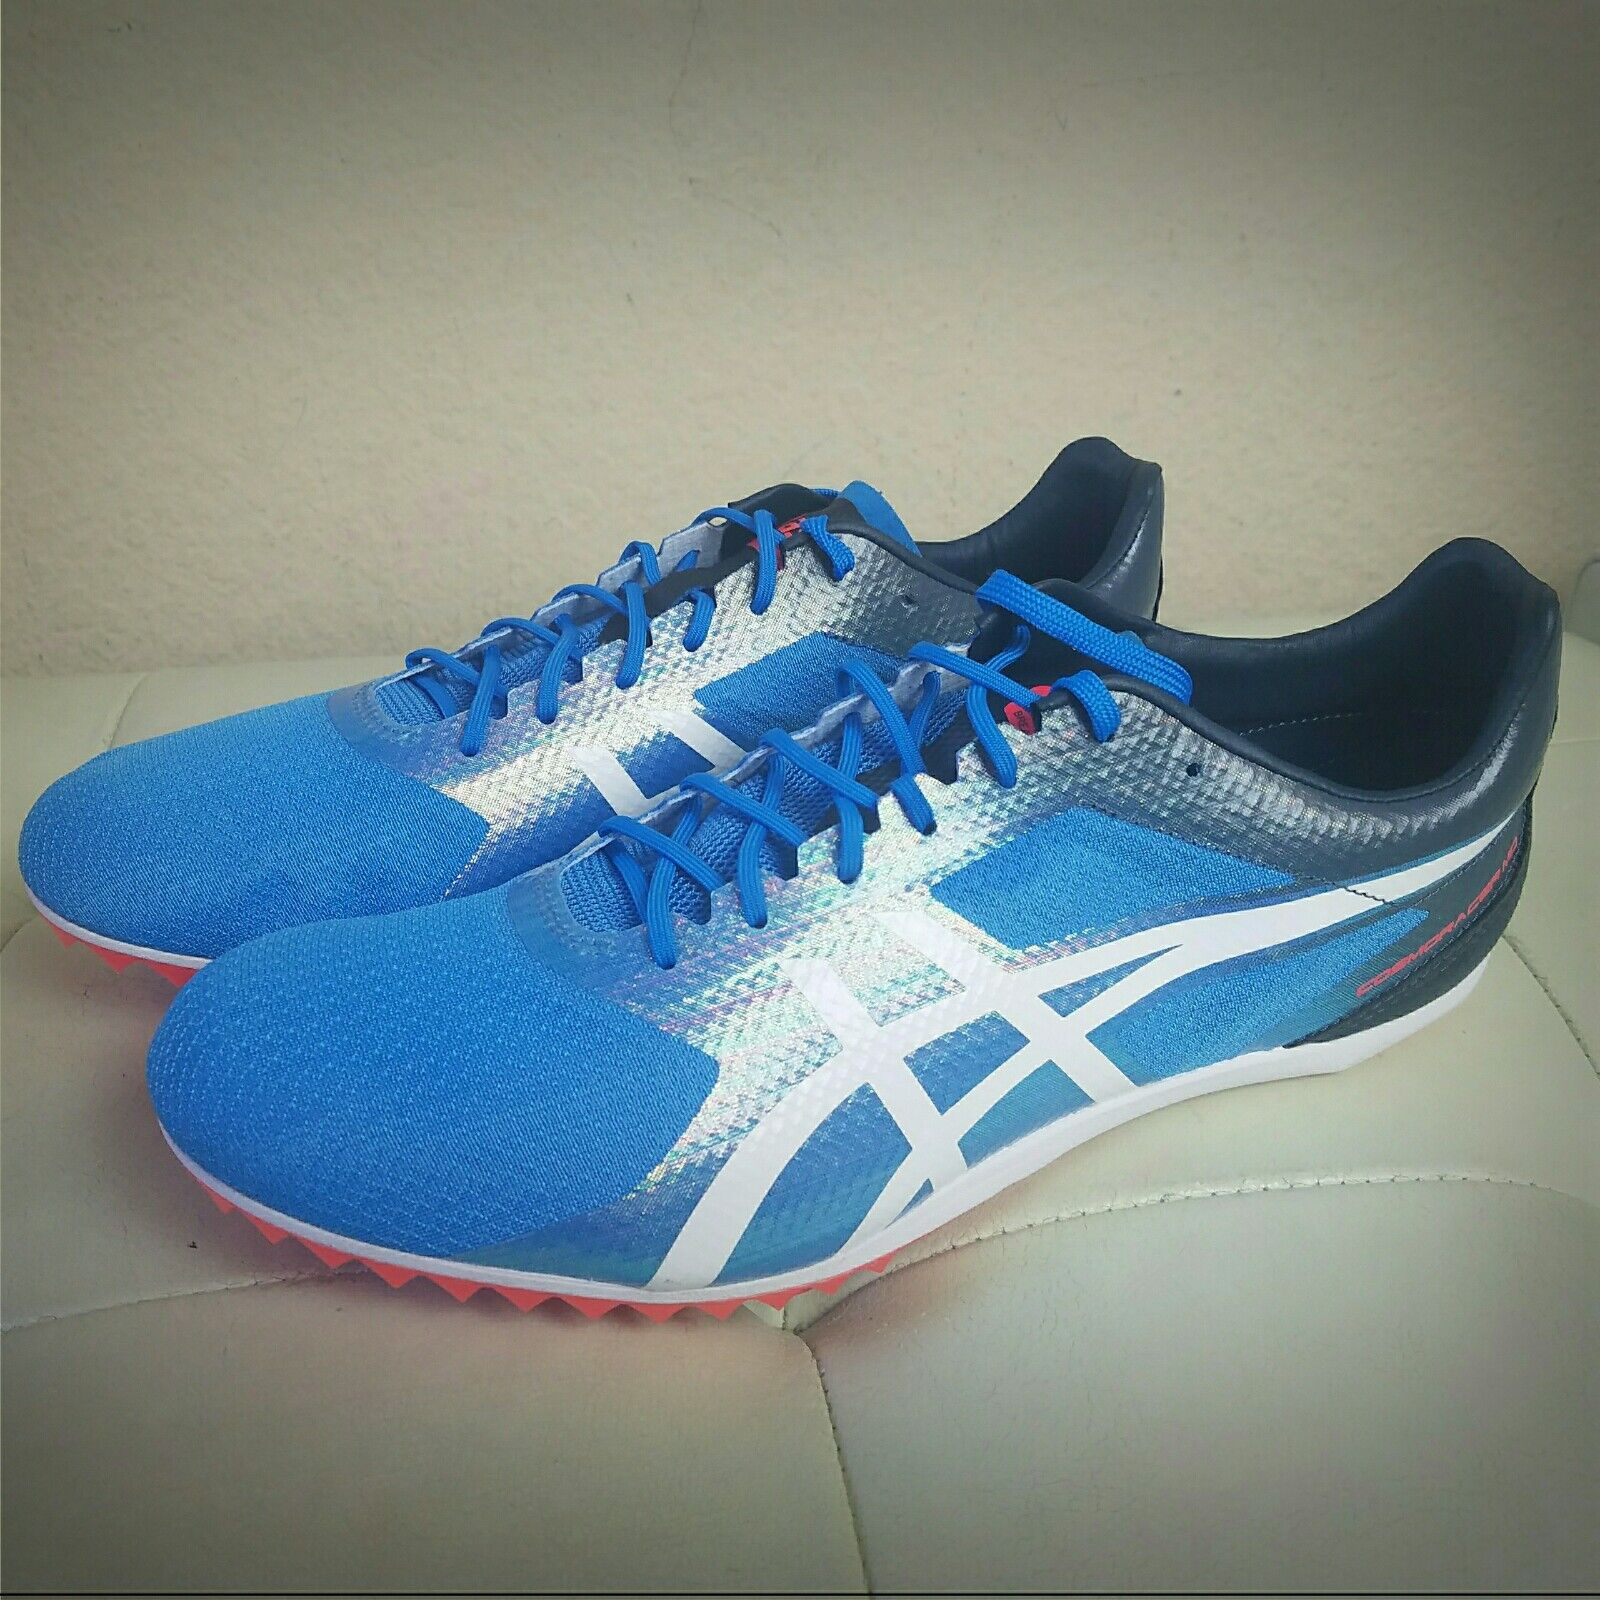 Le cosmoracer md Uomo scarpe da ginnastica blu g603y taglia 11 jet blu ginnastica / bianco / nero ardesia 804c6e